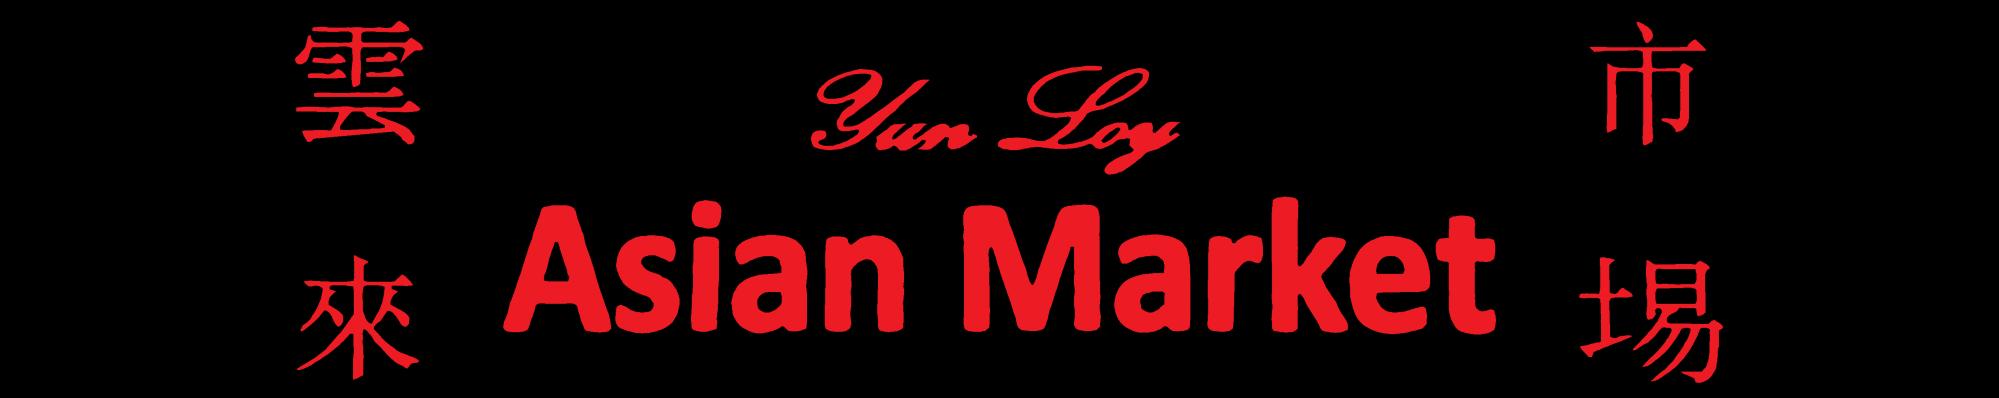 Yun Loy Asian Market